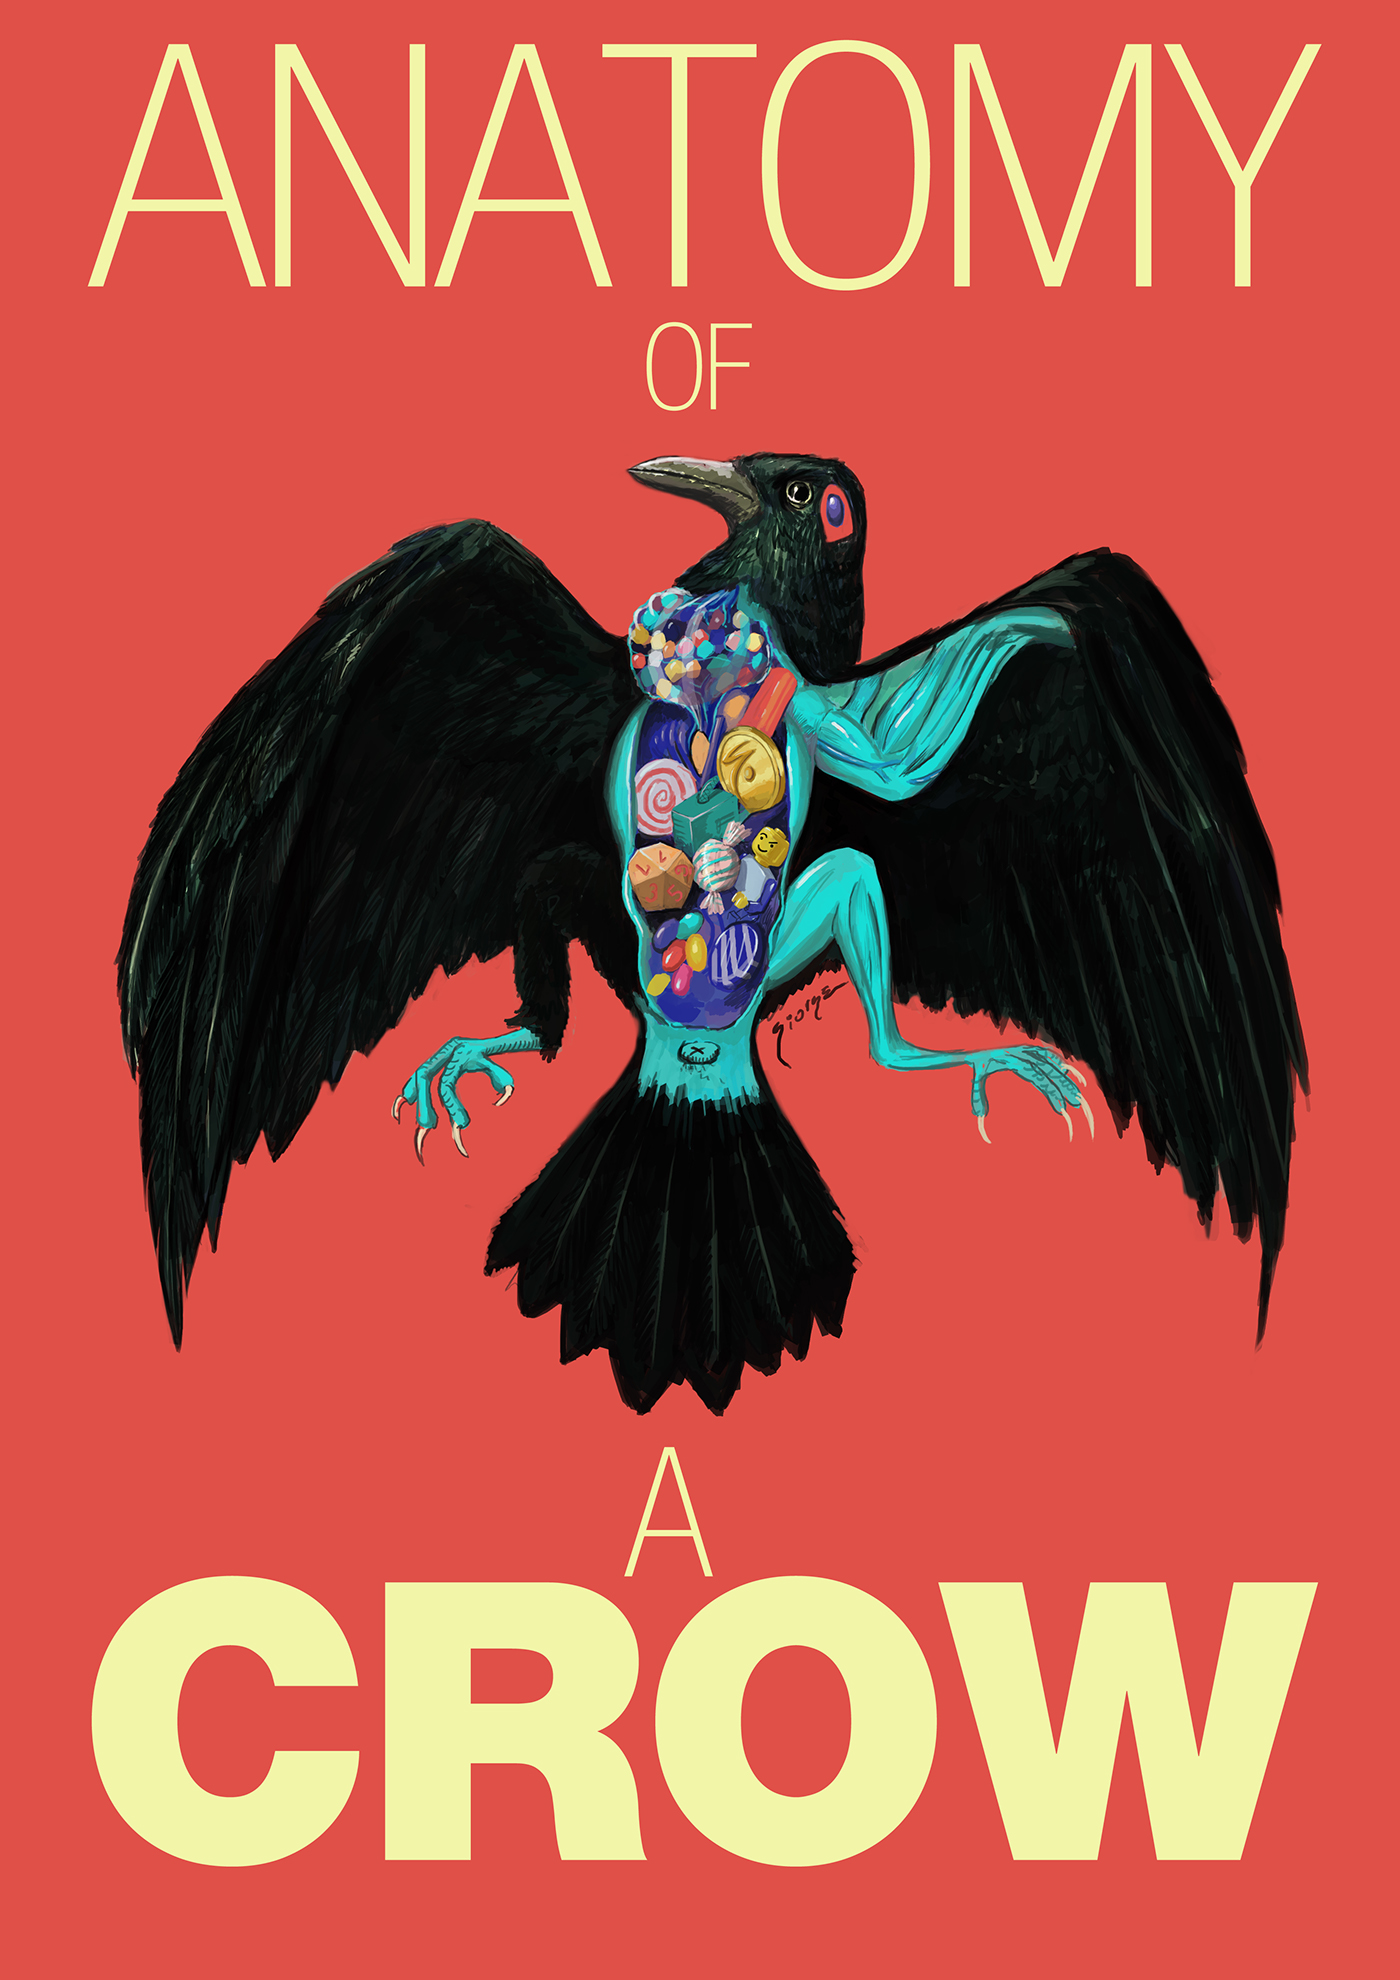 Anatomy of a crow